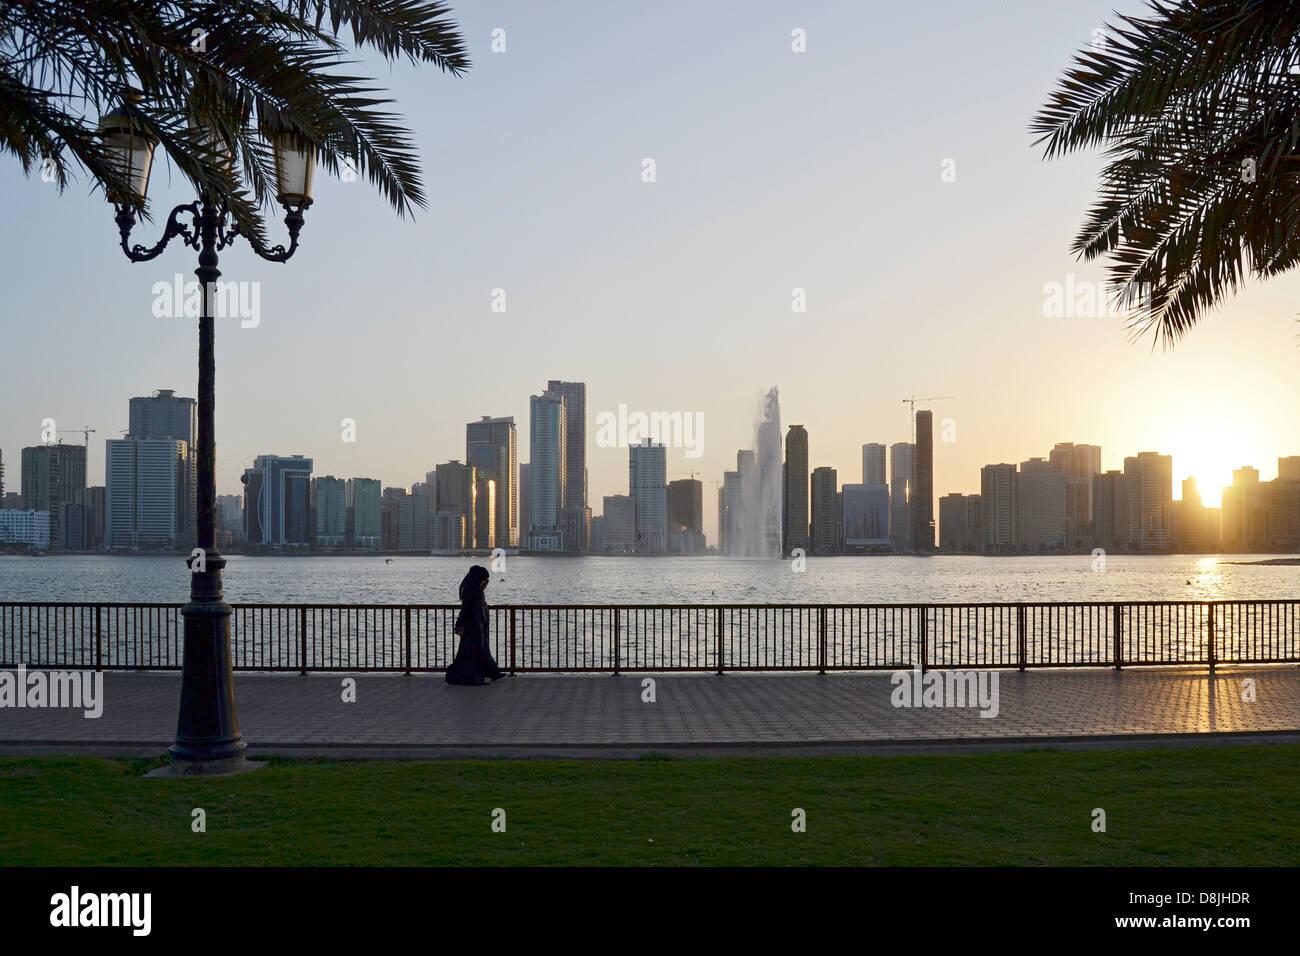 People on the Golden Mile, Sharjah, United Arab Emirates - Stock Image